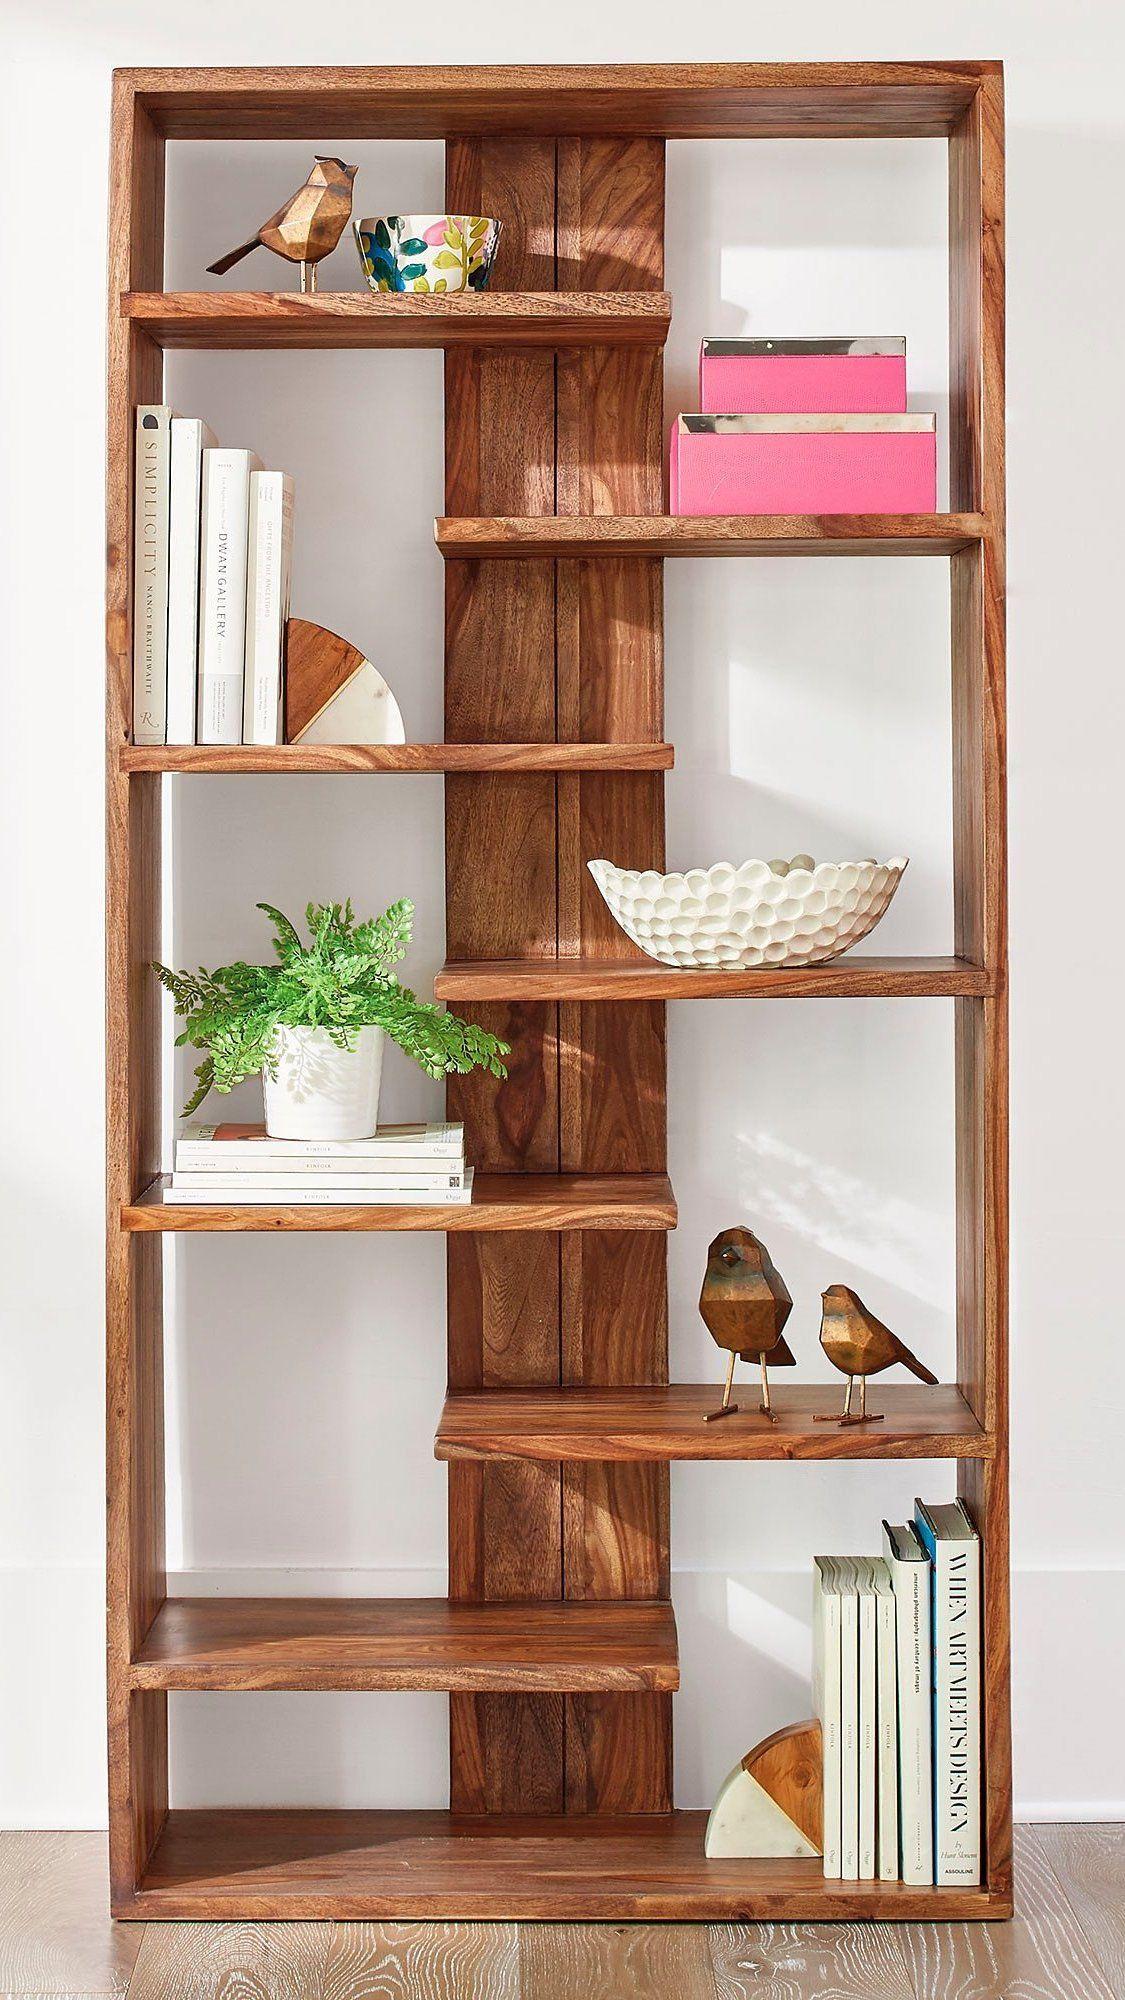 Atlas Sheesham Bookcase En 2020 Proyectos De Carpinteria Para Principiantes Pequenos Proyectos De Madera Muebles Para Libros